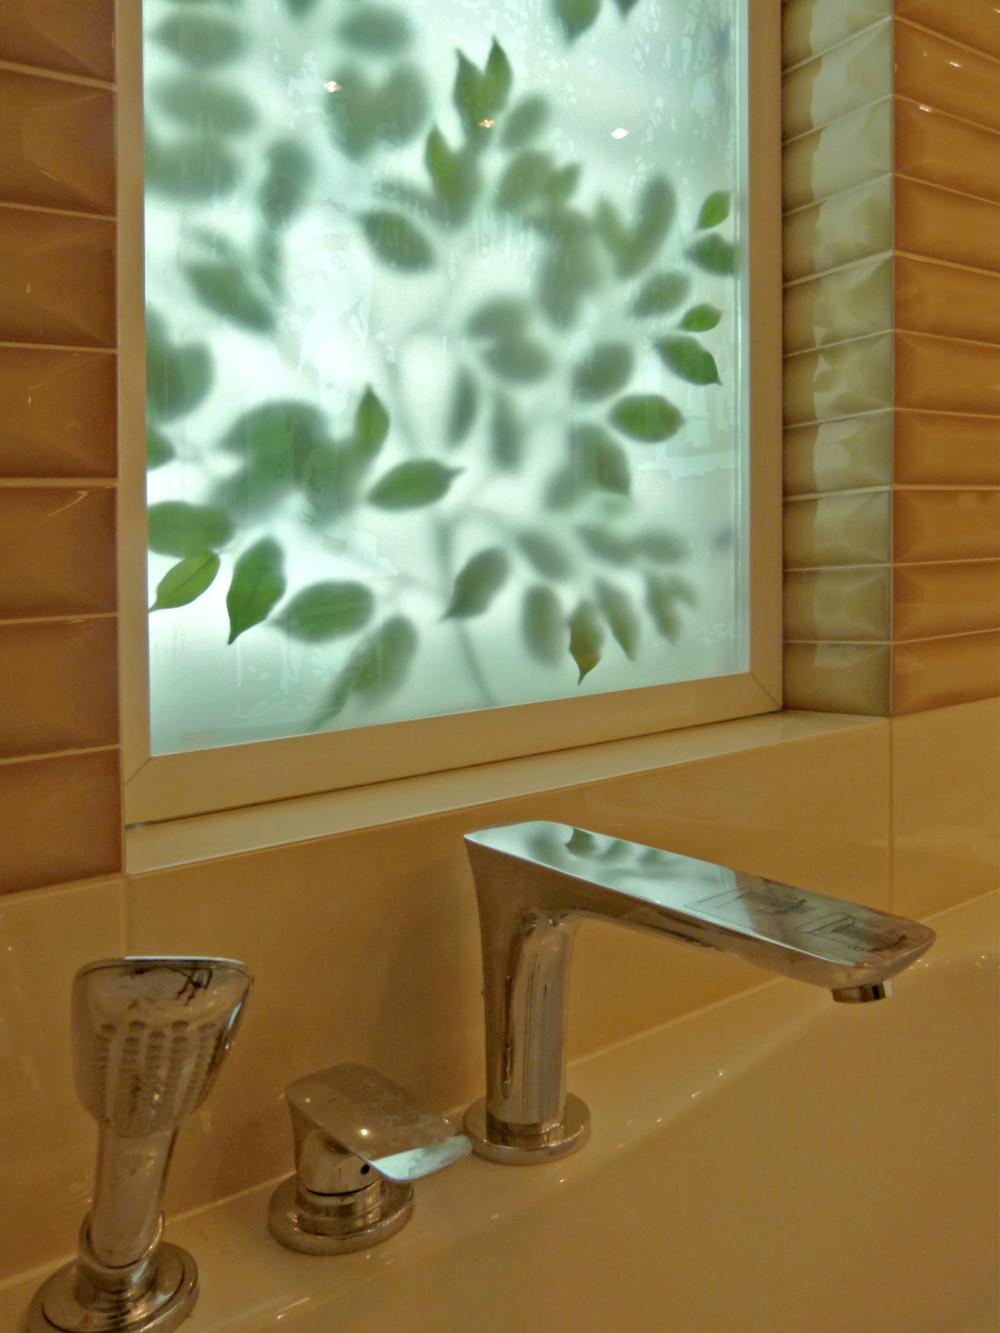 Декоративная подсветка фальш-окна